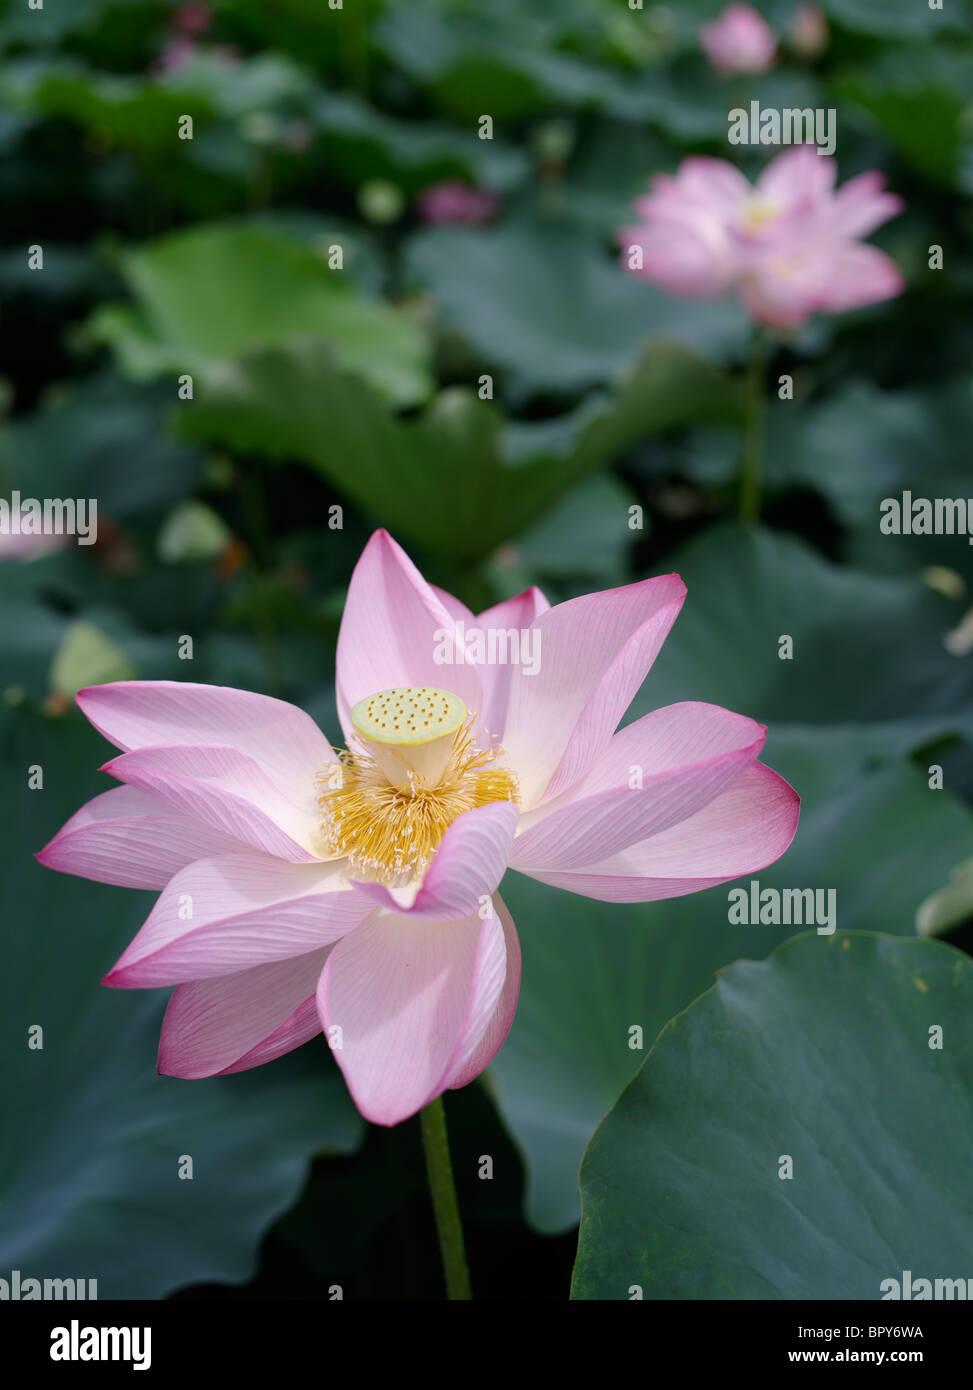 Indian lotus sacred stock photos indian lotus sacred stock images lotus flowers in the moat of akita castle akita city japan stock izmirmasajfo